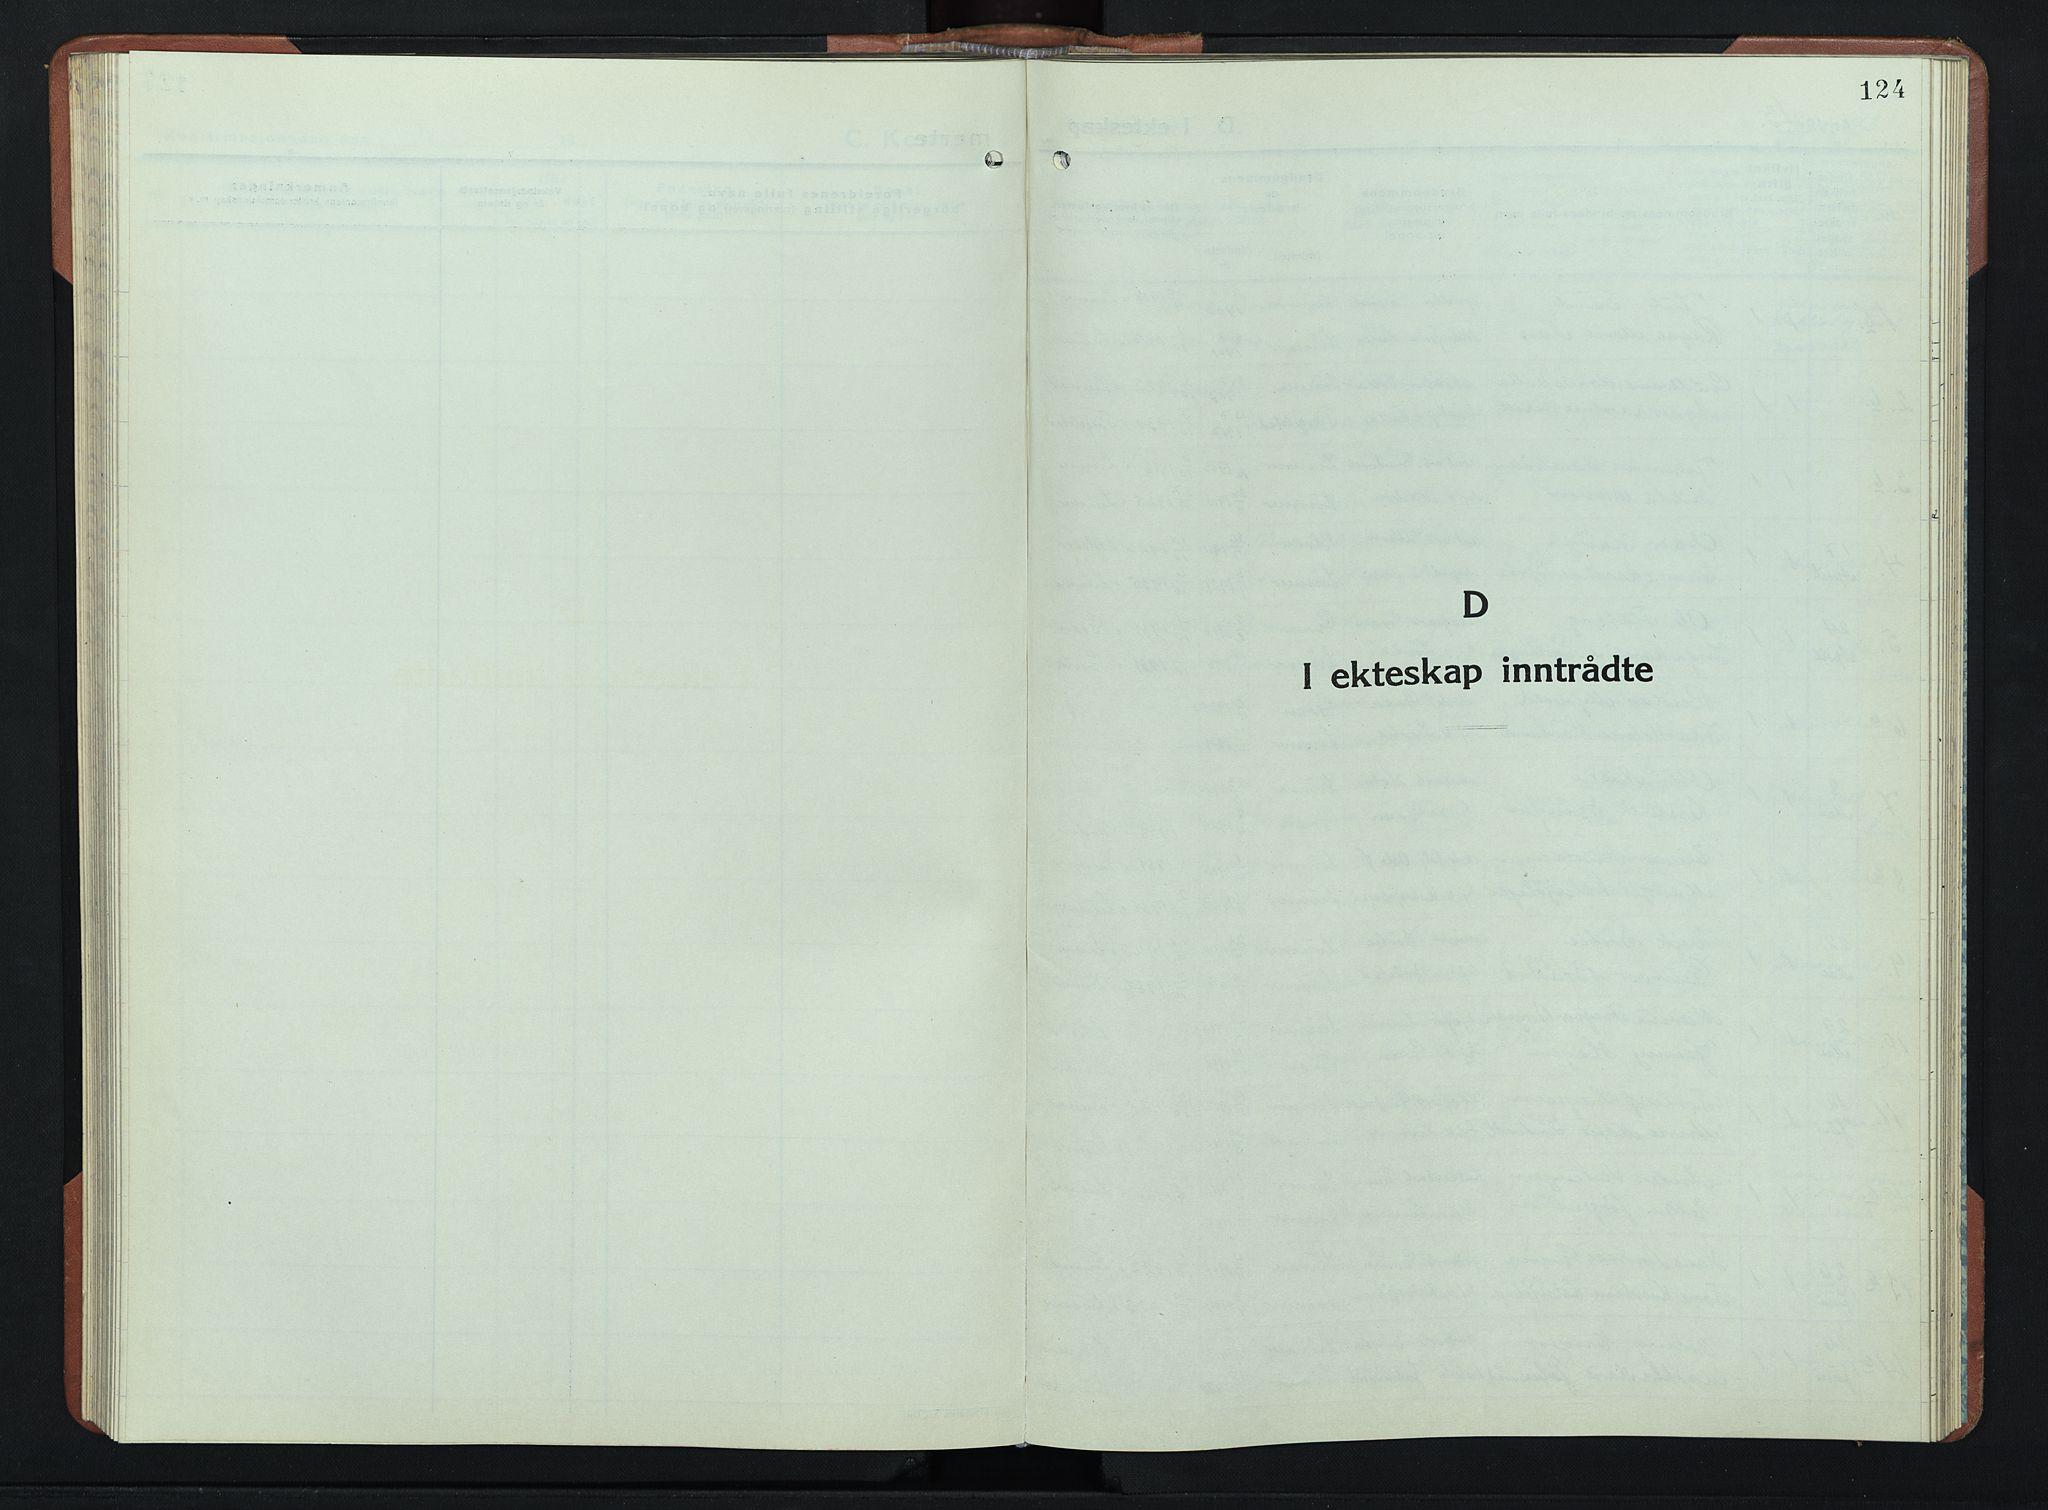 SAH, Lunner prestekontor, H/Ha/Hab/L0004: Klokkerbok nr. 4, 1943-1952, s. 124